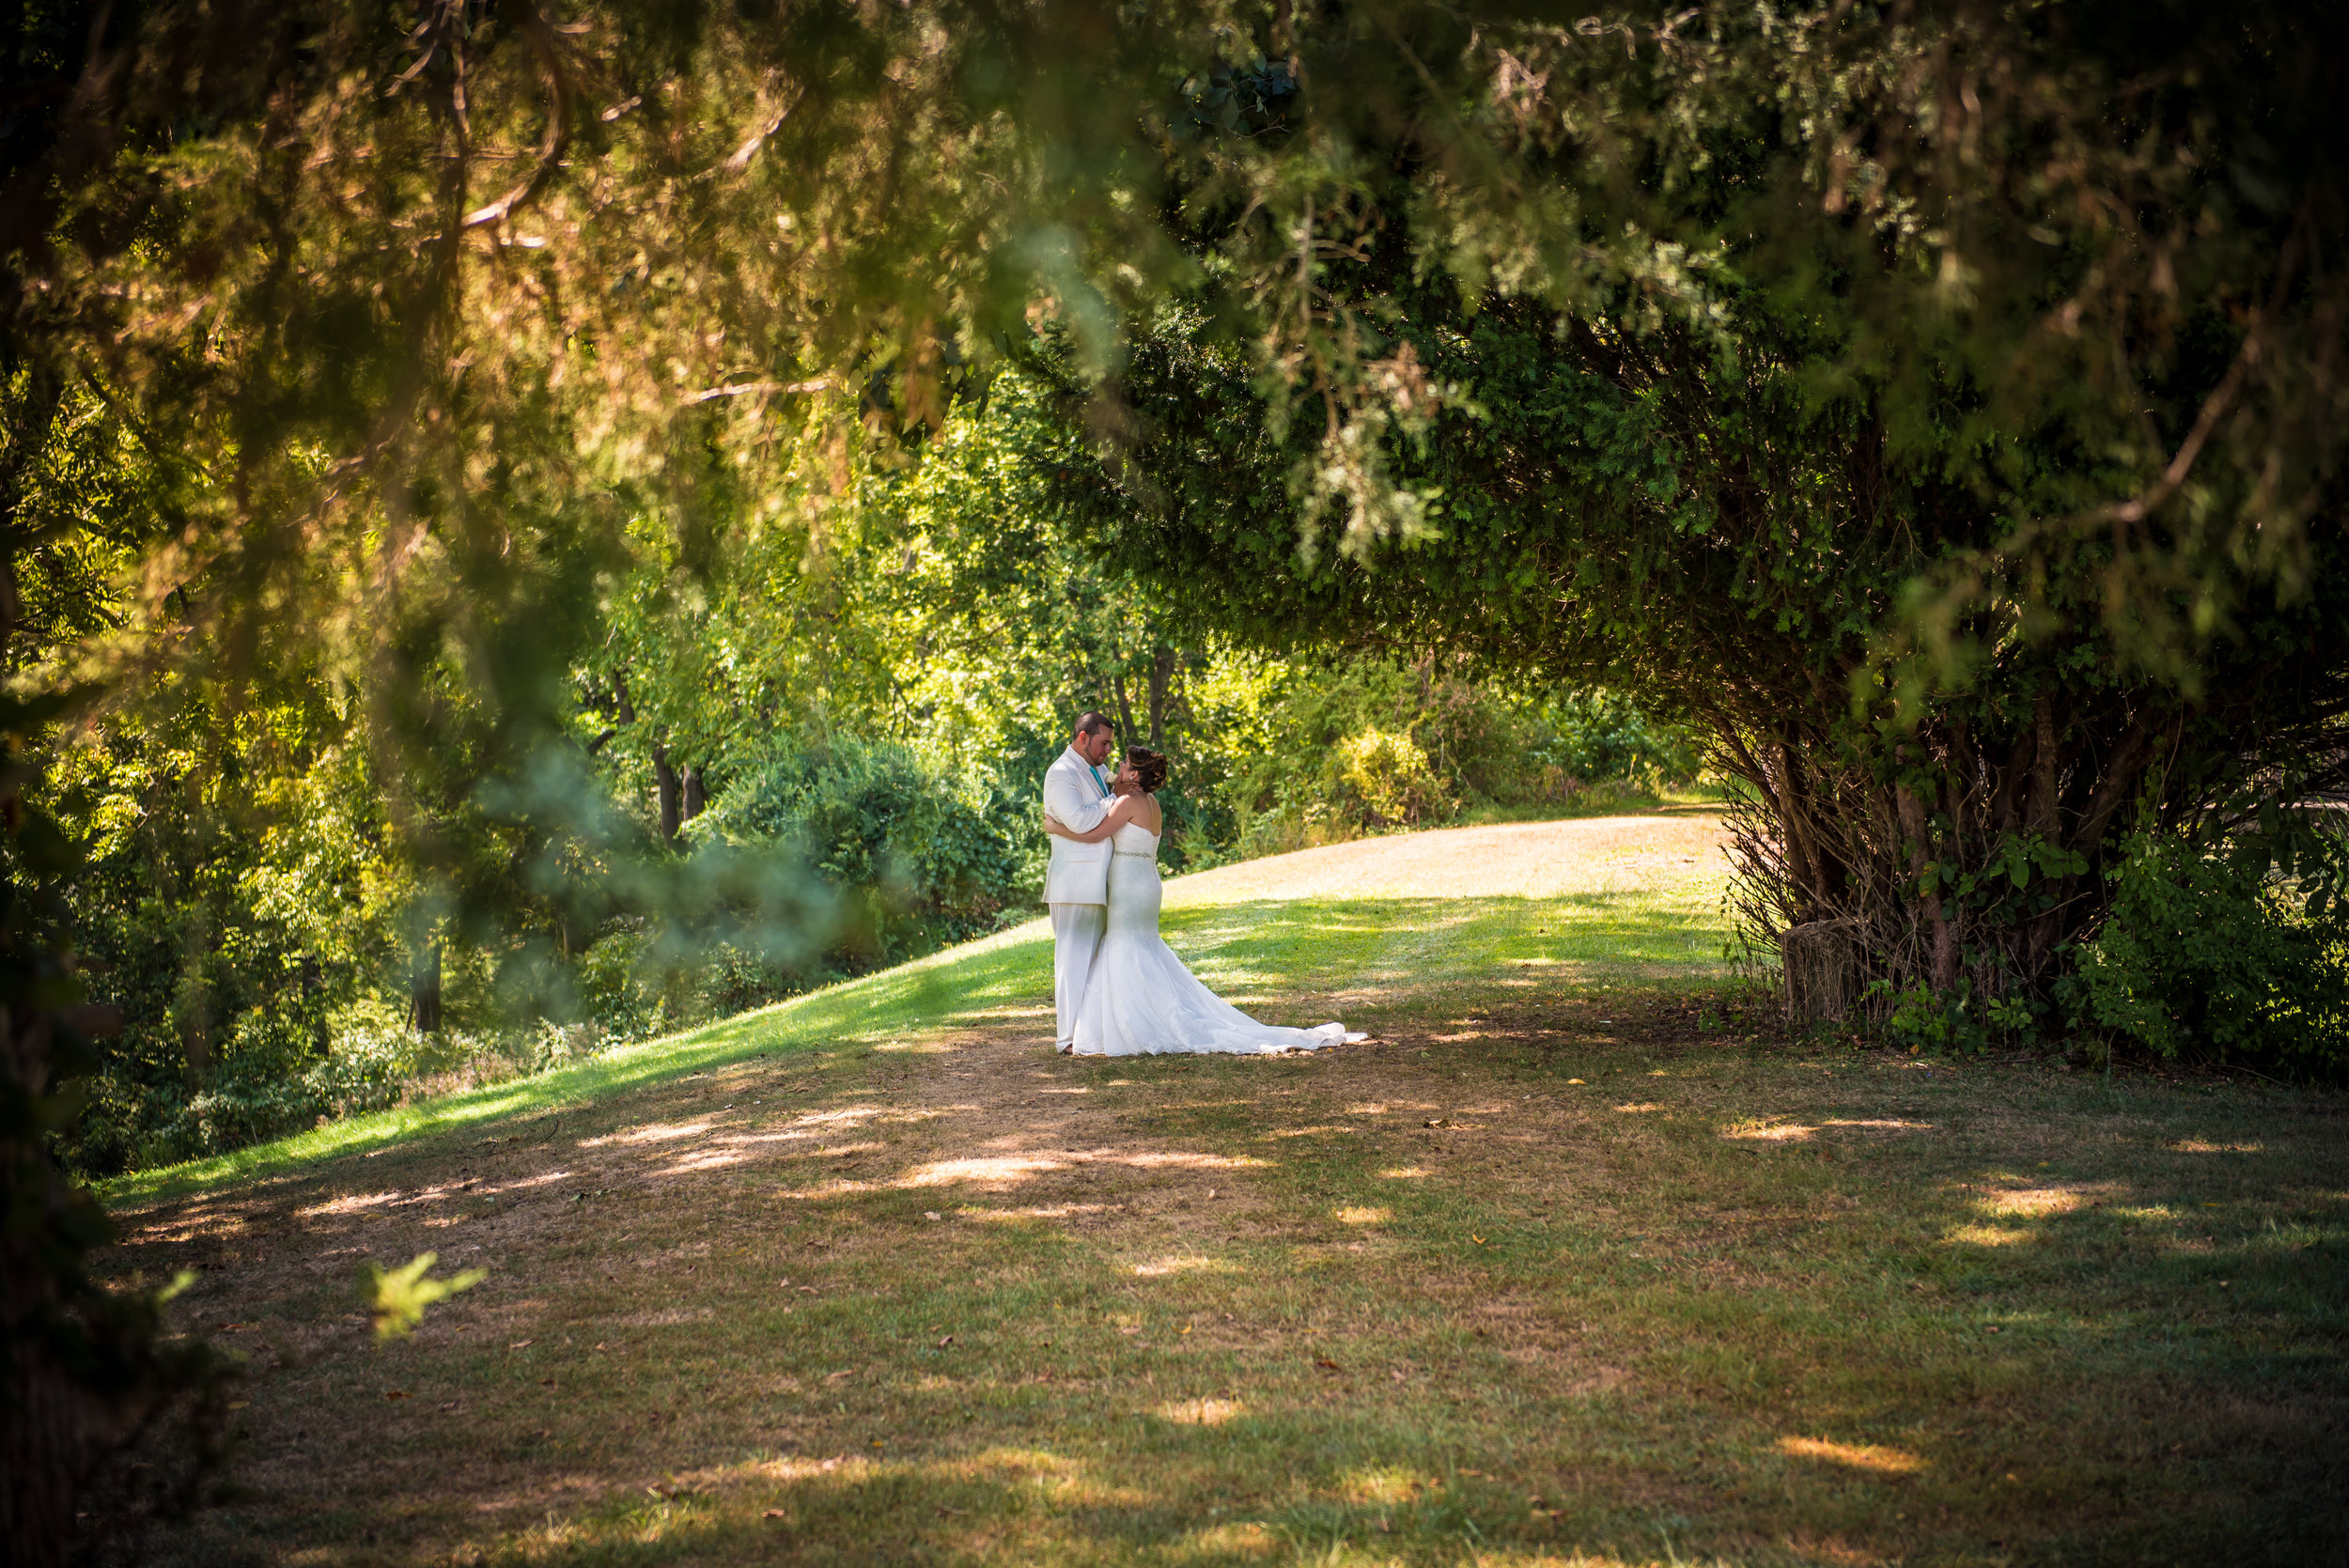 Nj Wedding photography outdoors